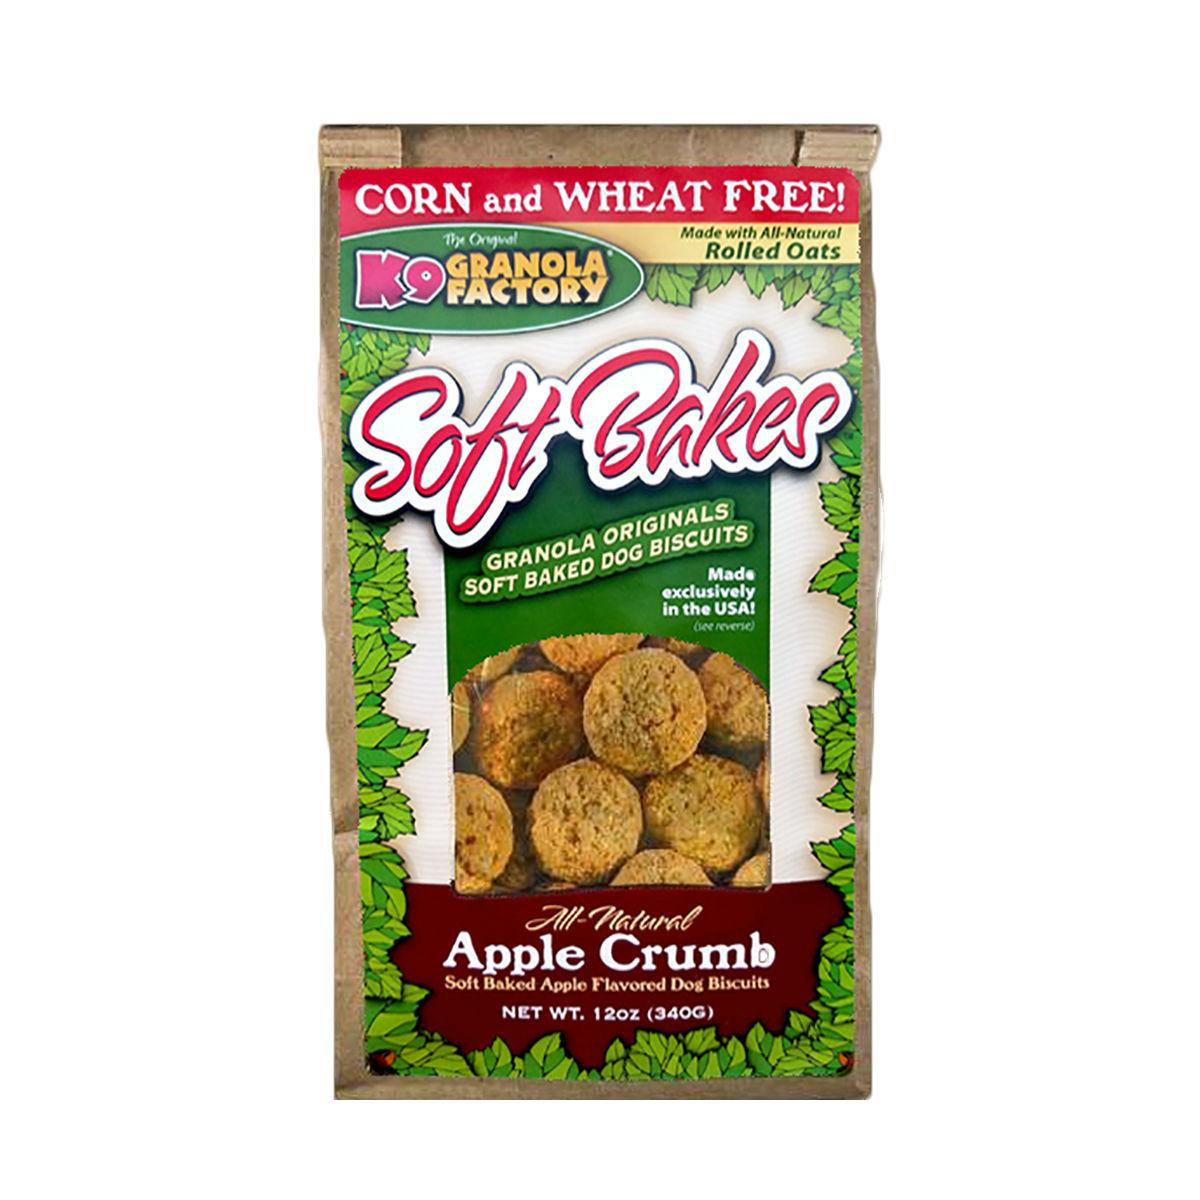 K9 Granola Factory Soft Bakes Dog Treat - Apple Crumb